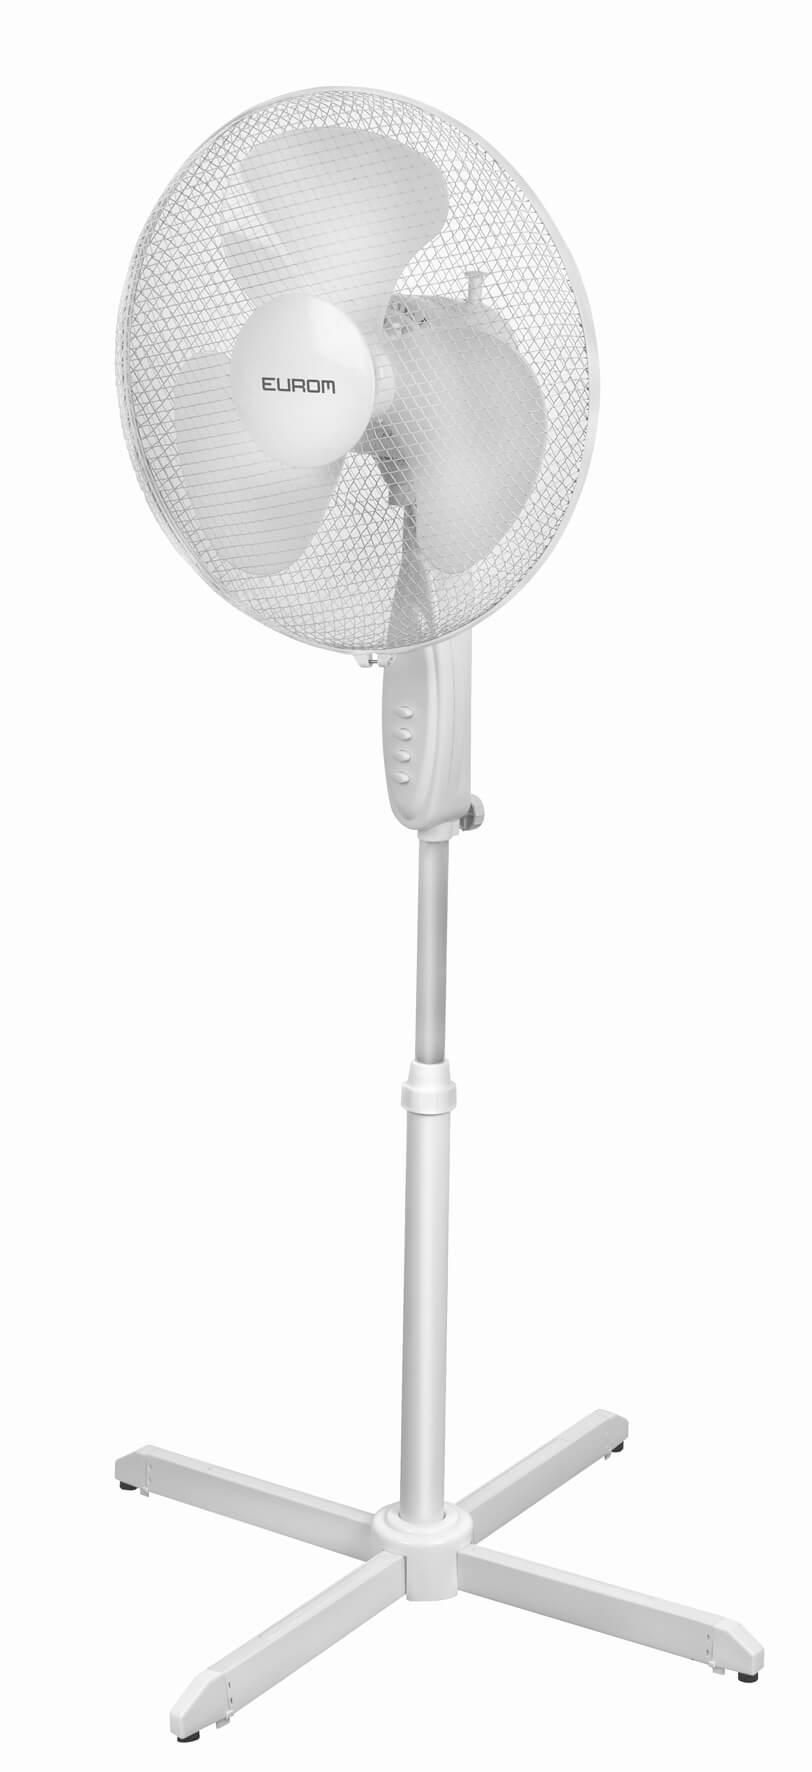 Eurom VS16 staande ventilator ø40cm | Staand model 45W